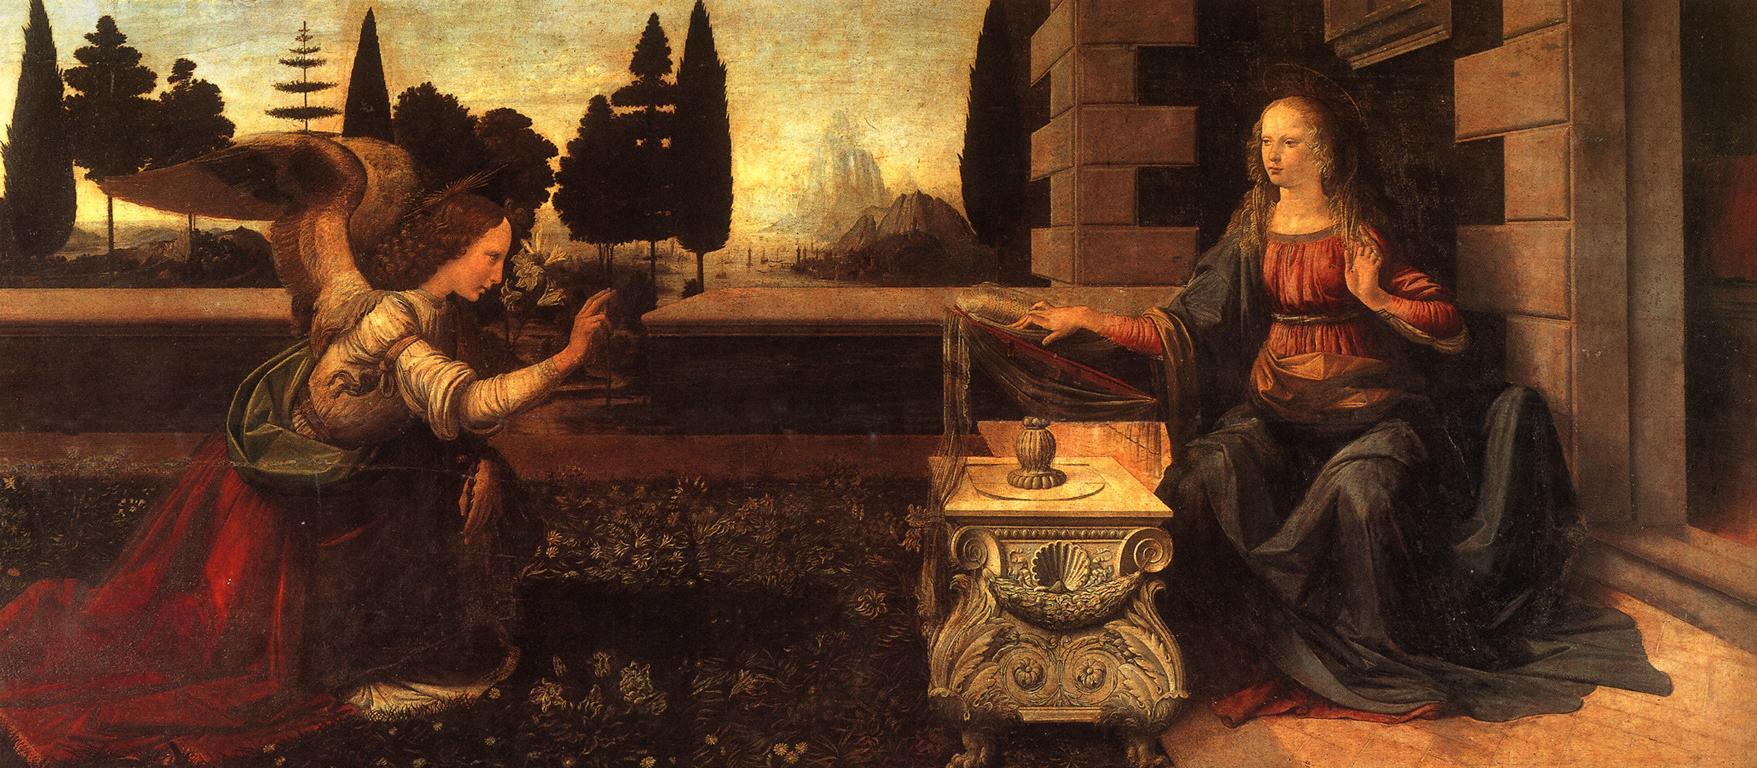 The Annunciation by Leonardo da Vinci; taken from Wikipedia